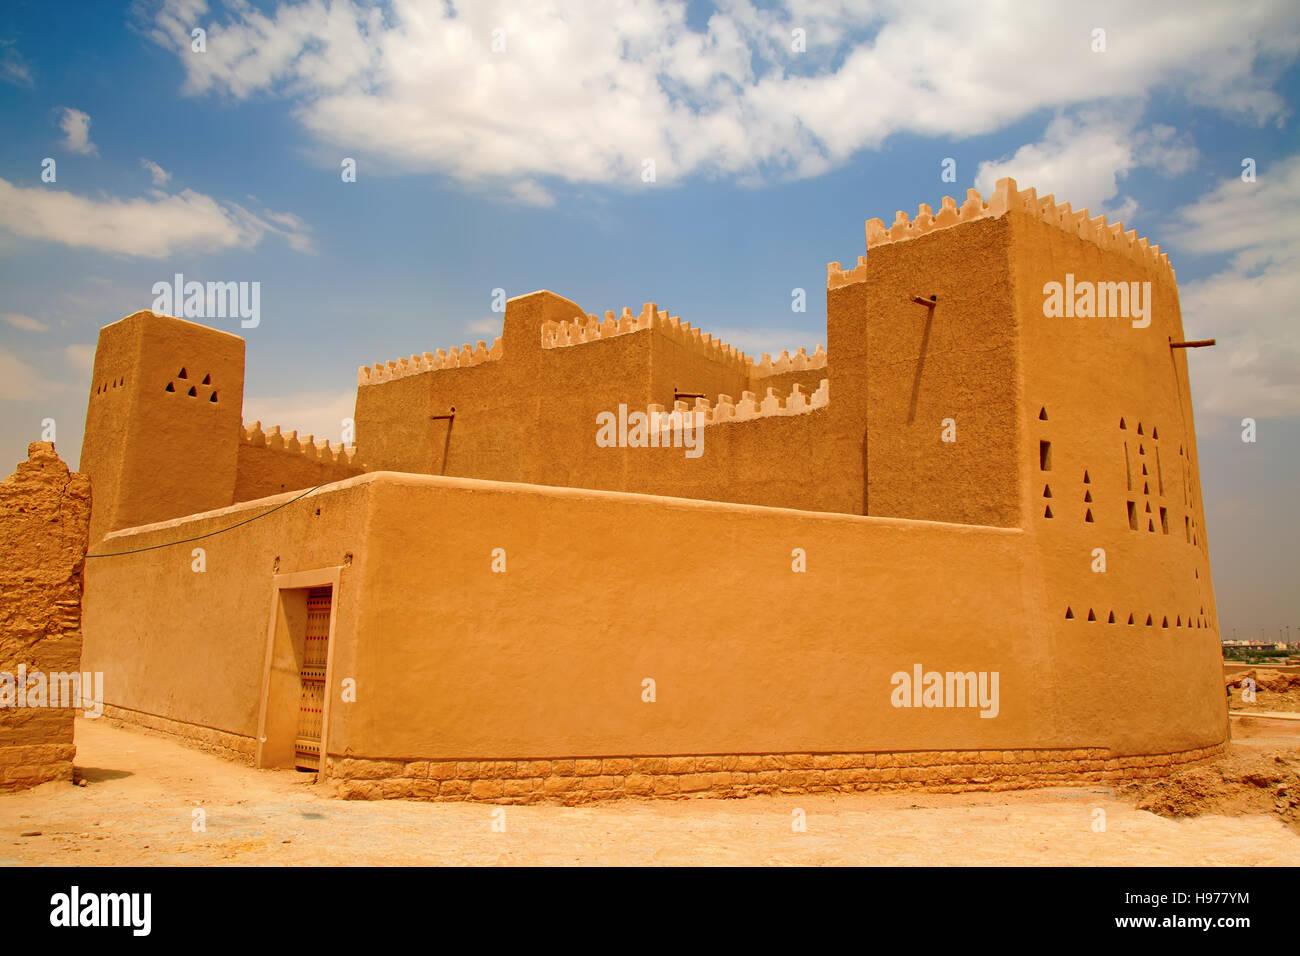 Streets of the old city Diriyah near Ar Riyadh, Kingdom of Saudi Arabia - Stock Image